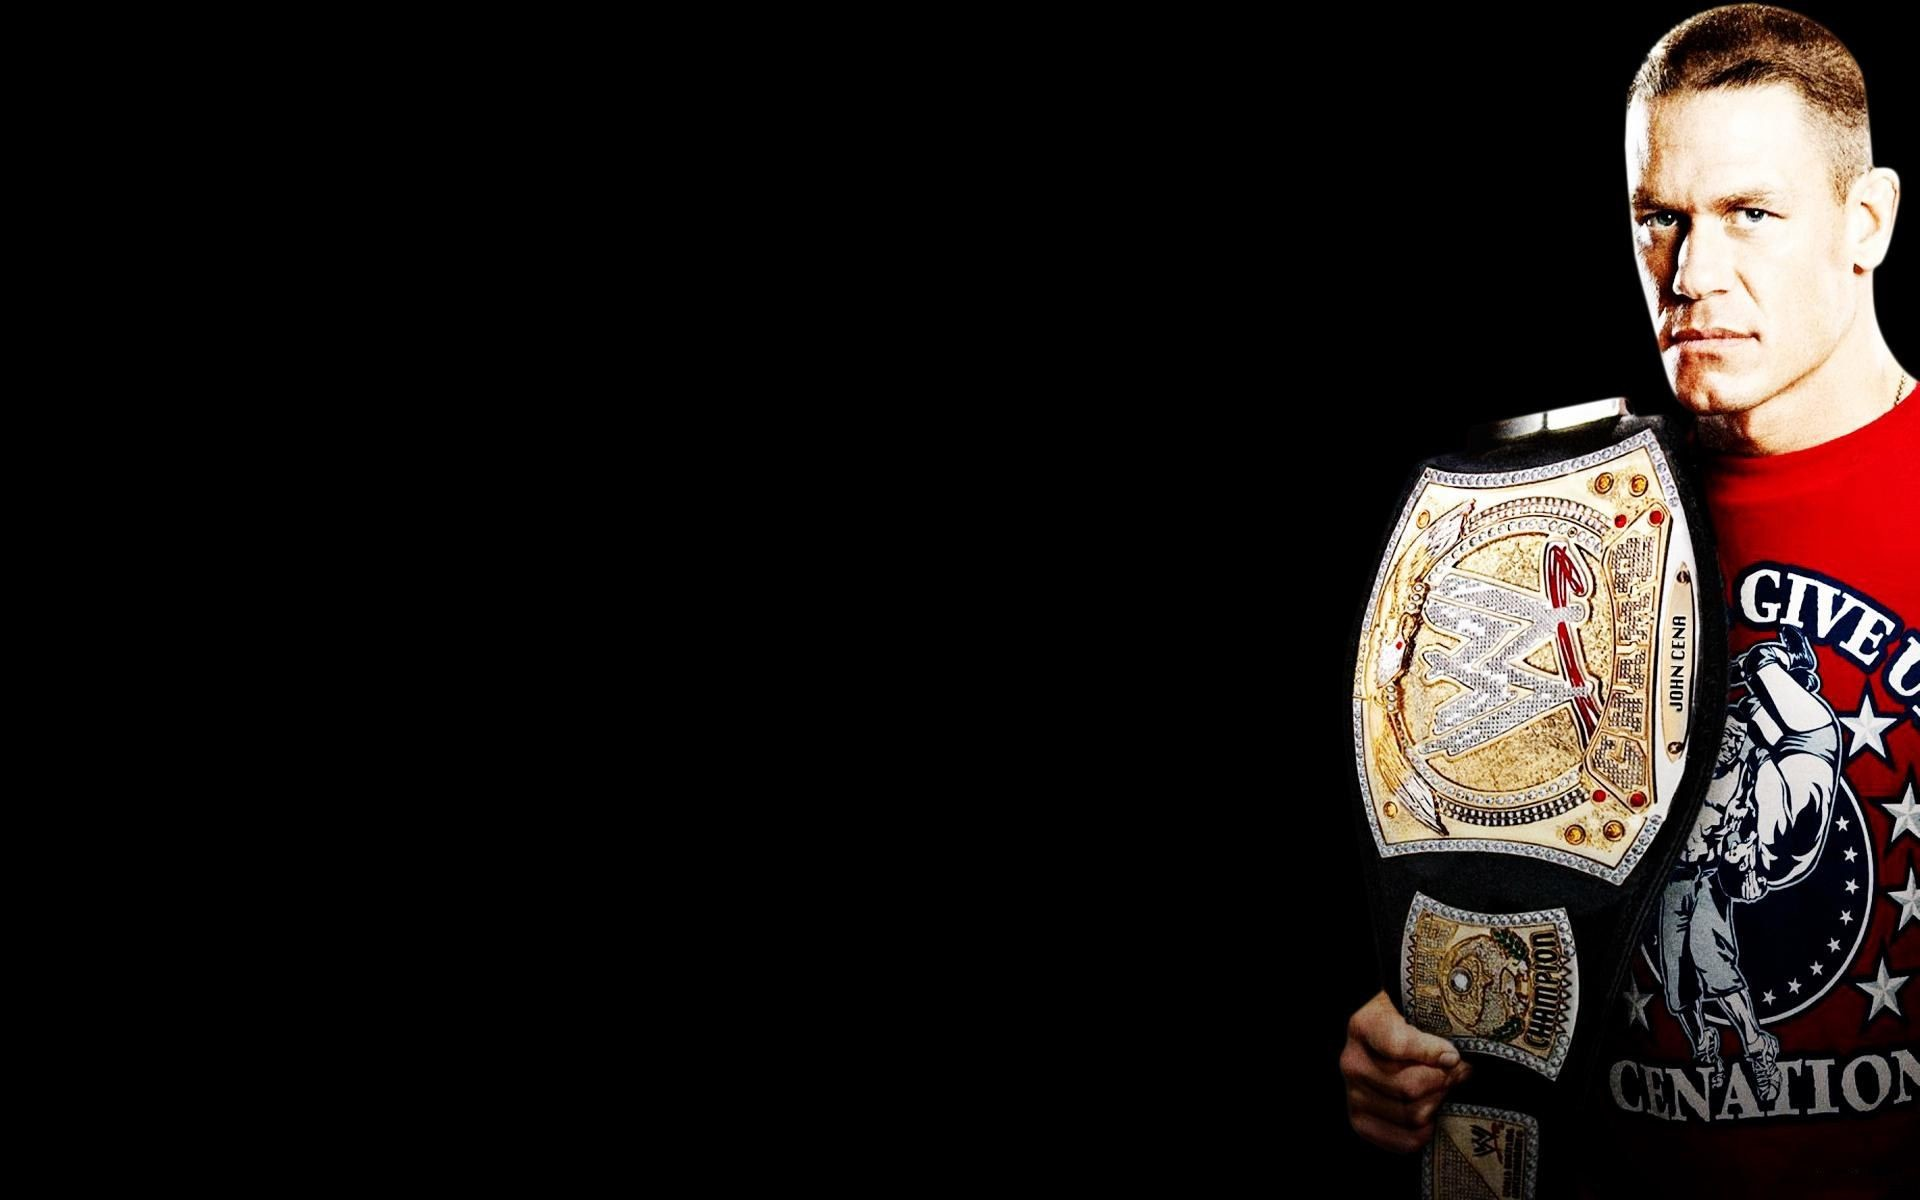 … wallpaper John Cena hd images John Cena desktops …